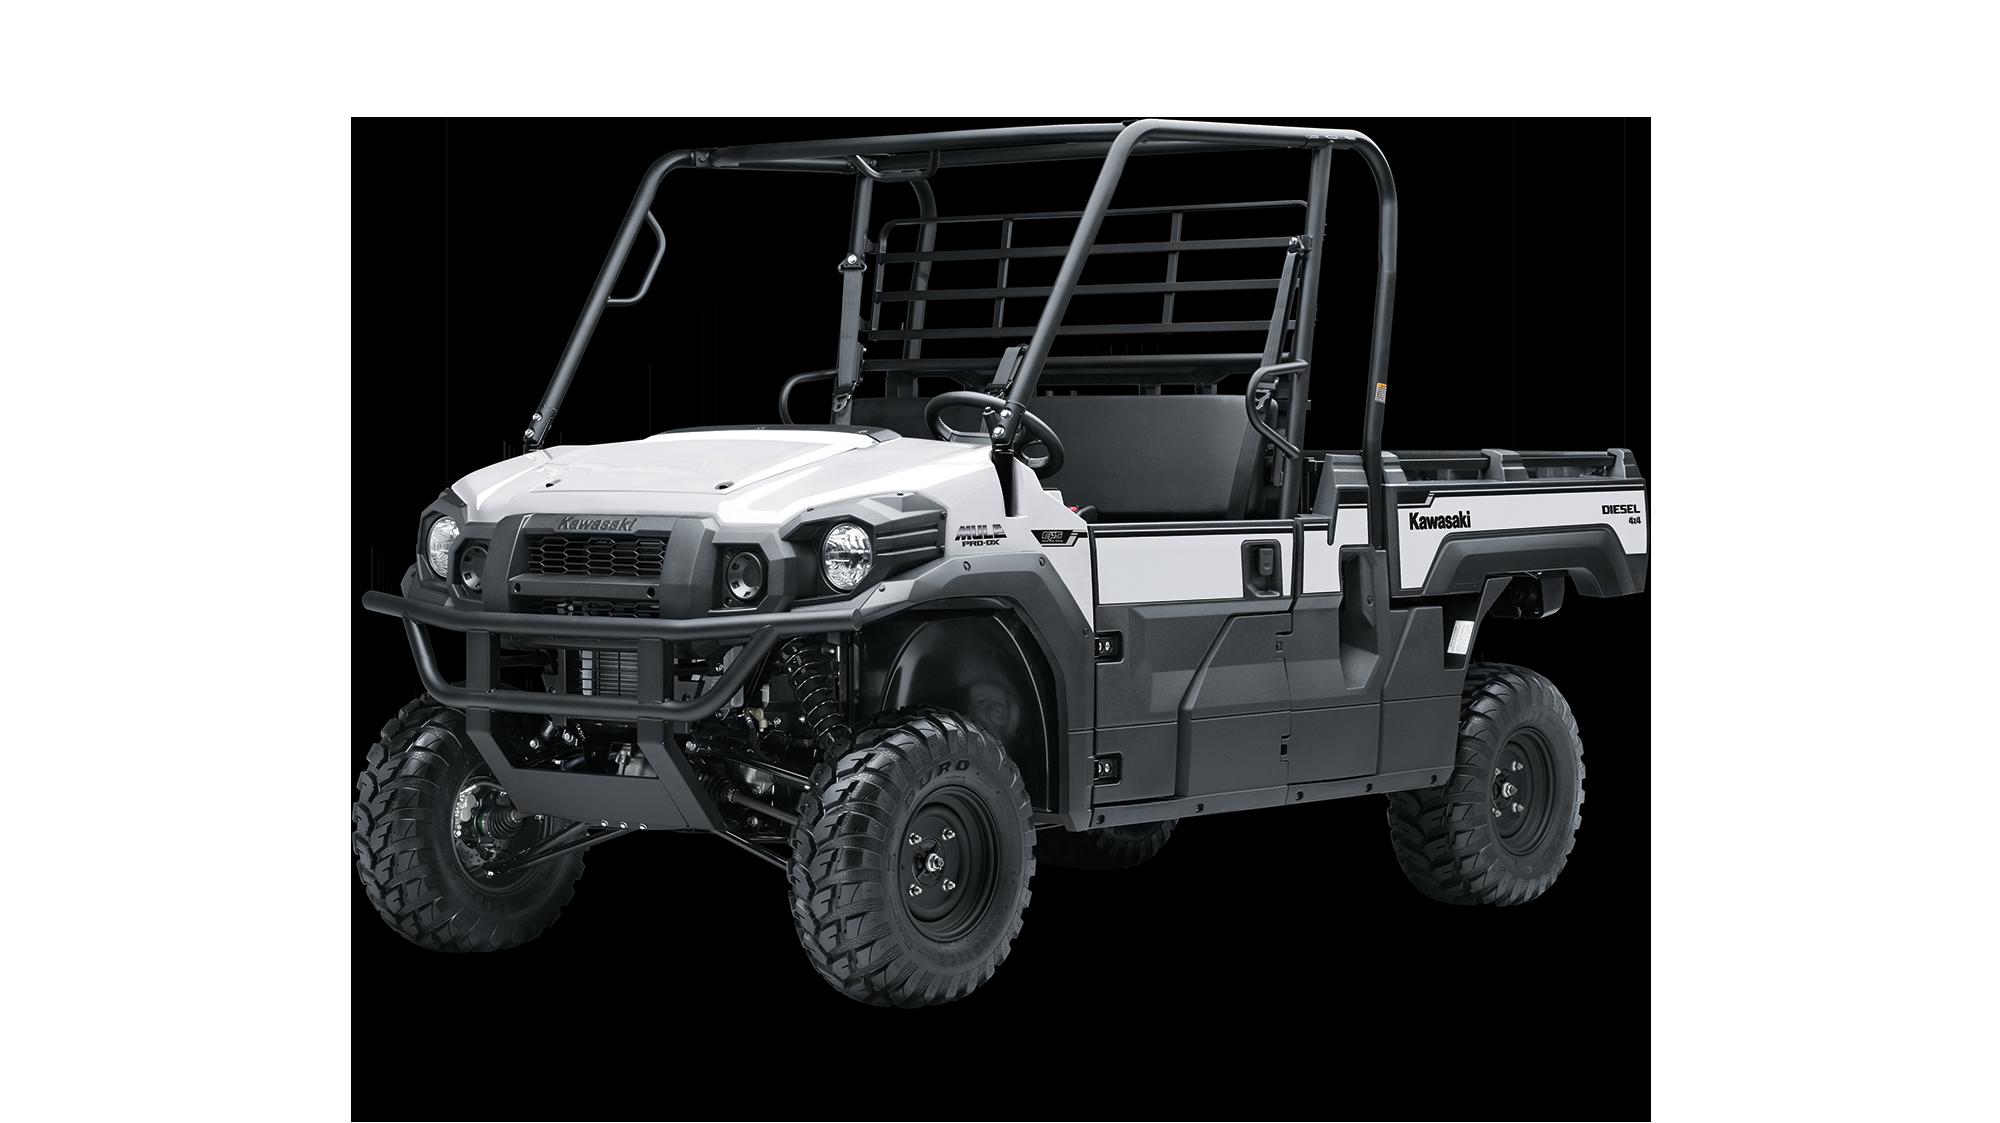 2020 Kawasaki Mule PRO-DX EPS Diesel